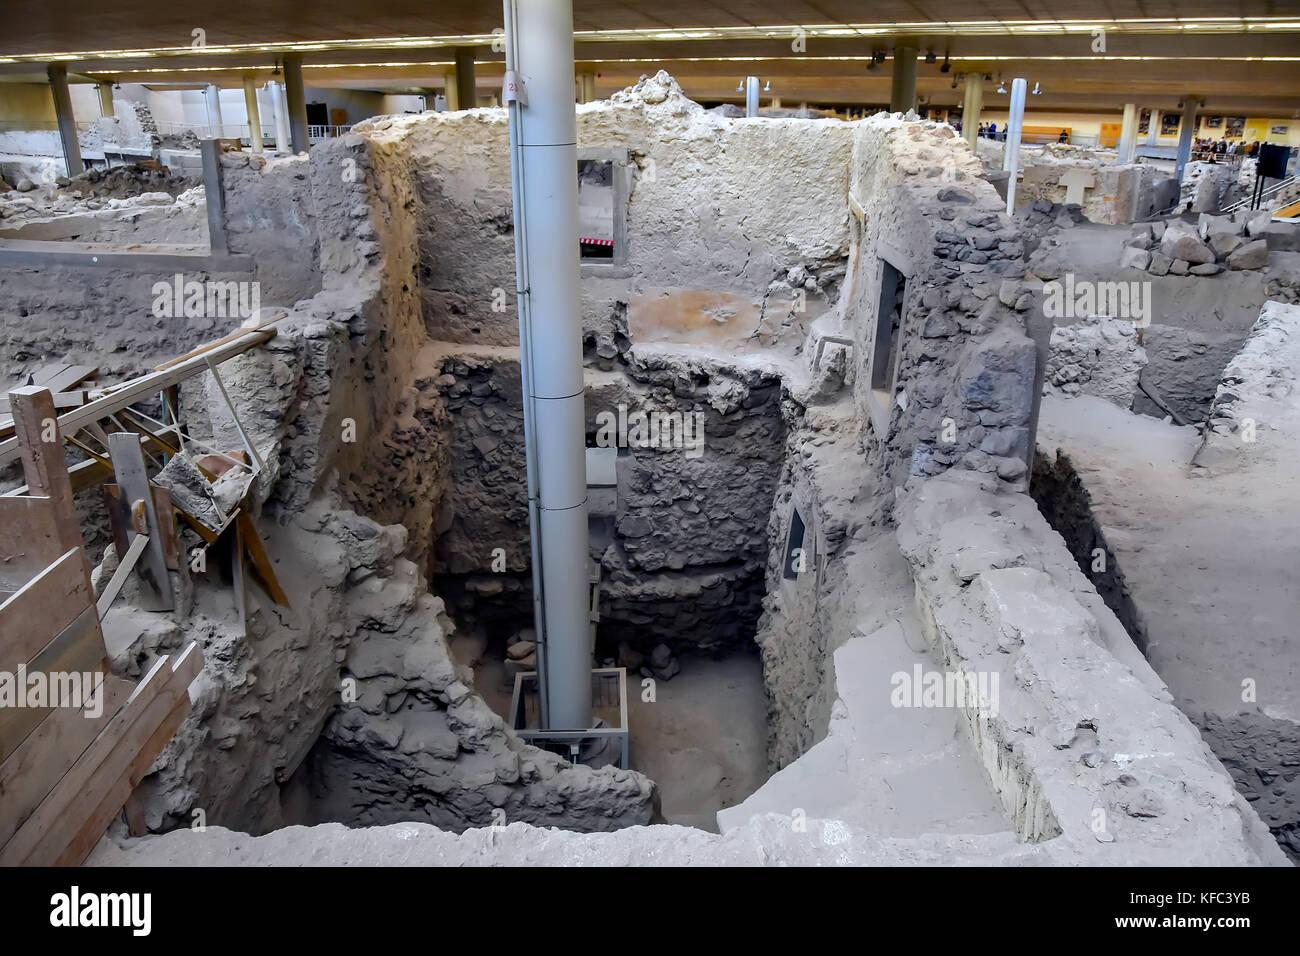 Akrotiri Minoan archaeolgical site showing multi-story building  at Santorini, Cyclades, Aegean Sea, Greece.dews - Stock Image